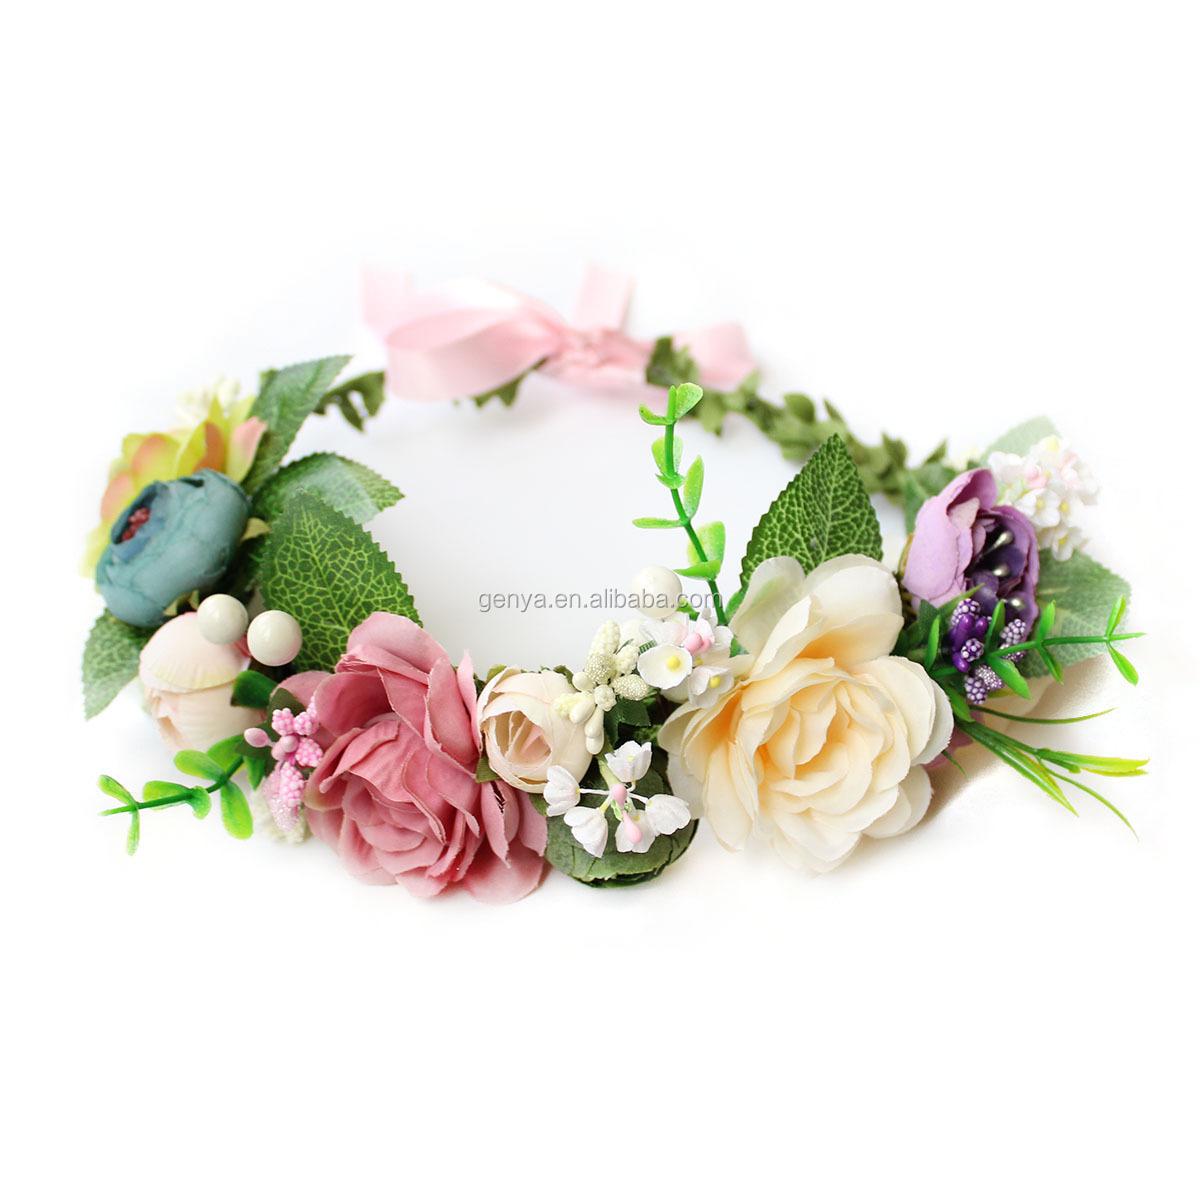 Fancy wedding veil hair accessories handmade crystal flower headband for bride crown tiaras headwear